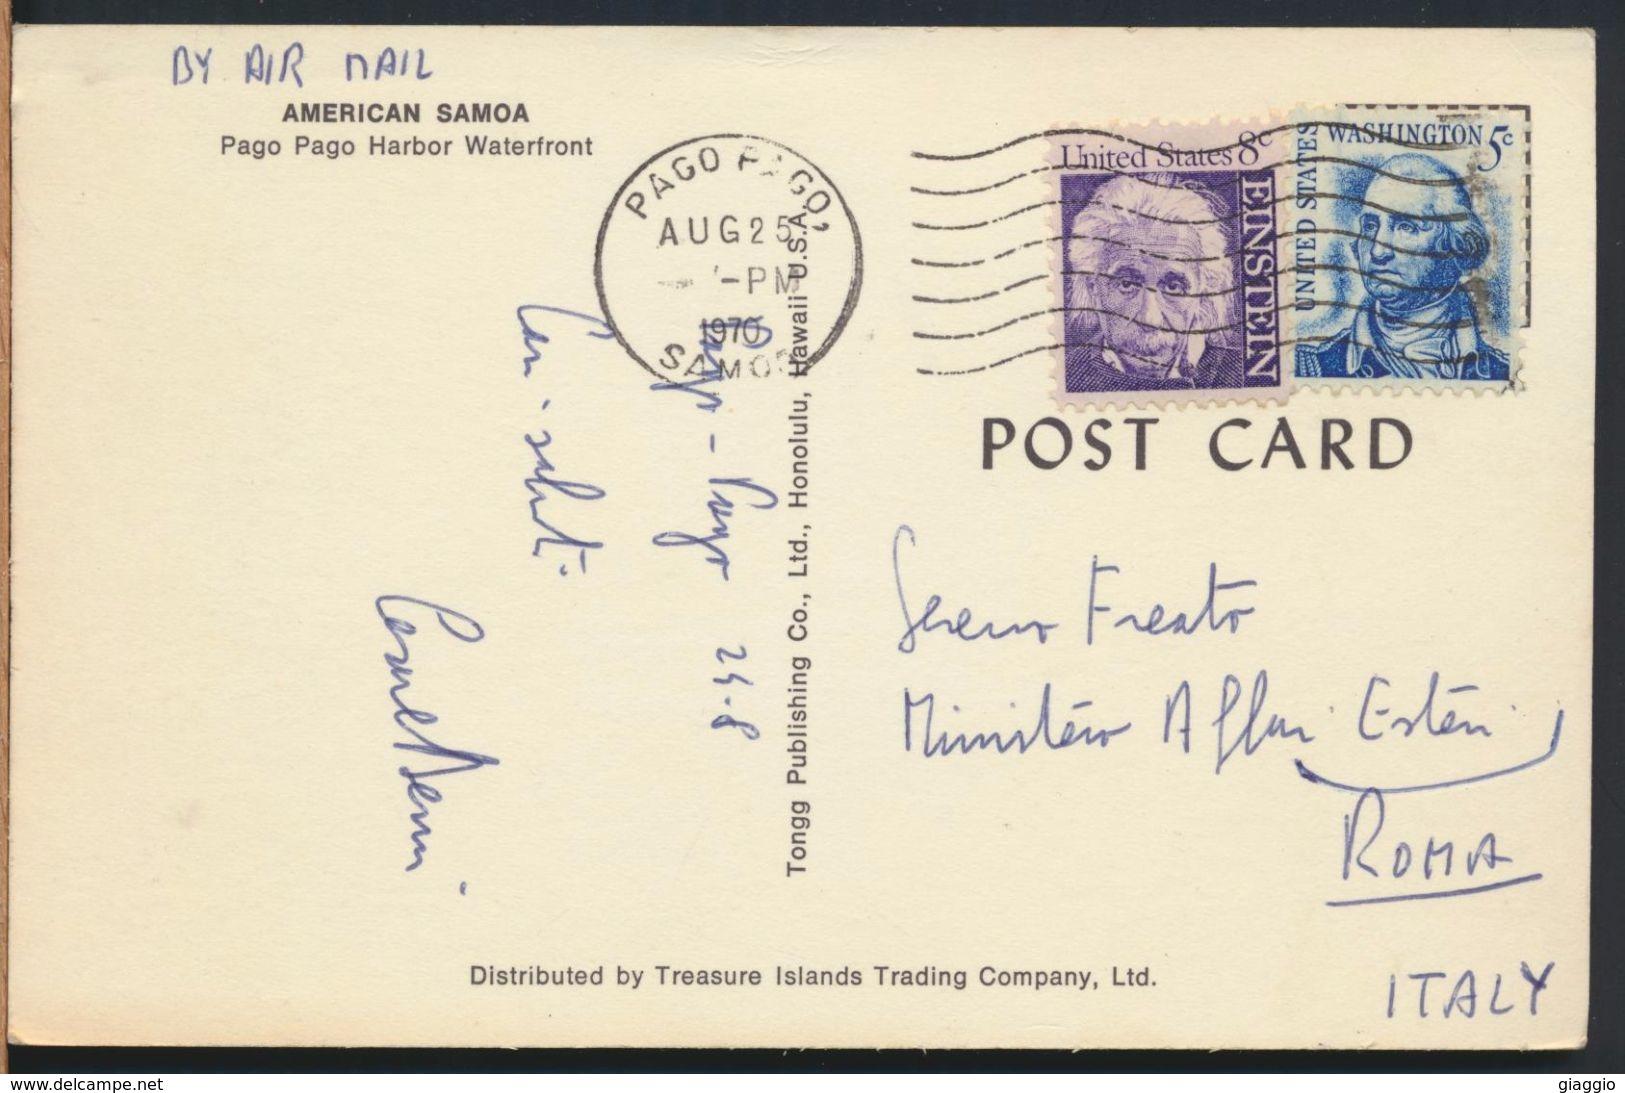 °°° 7947 - AMERICAN SAMOA - PAGO PAGO HARBOR WATERFRONT - 1970 With Stamps °°° - Samoa Americana